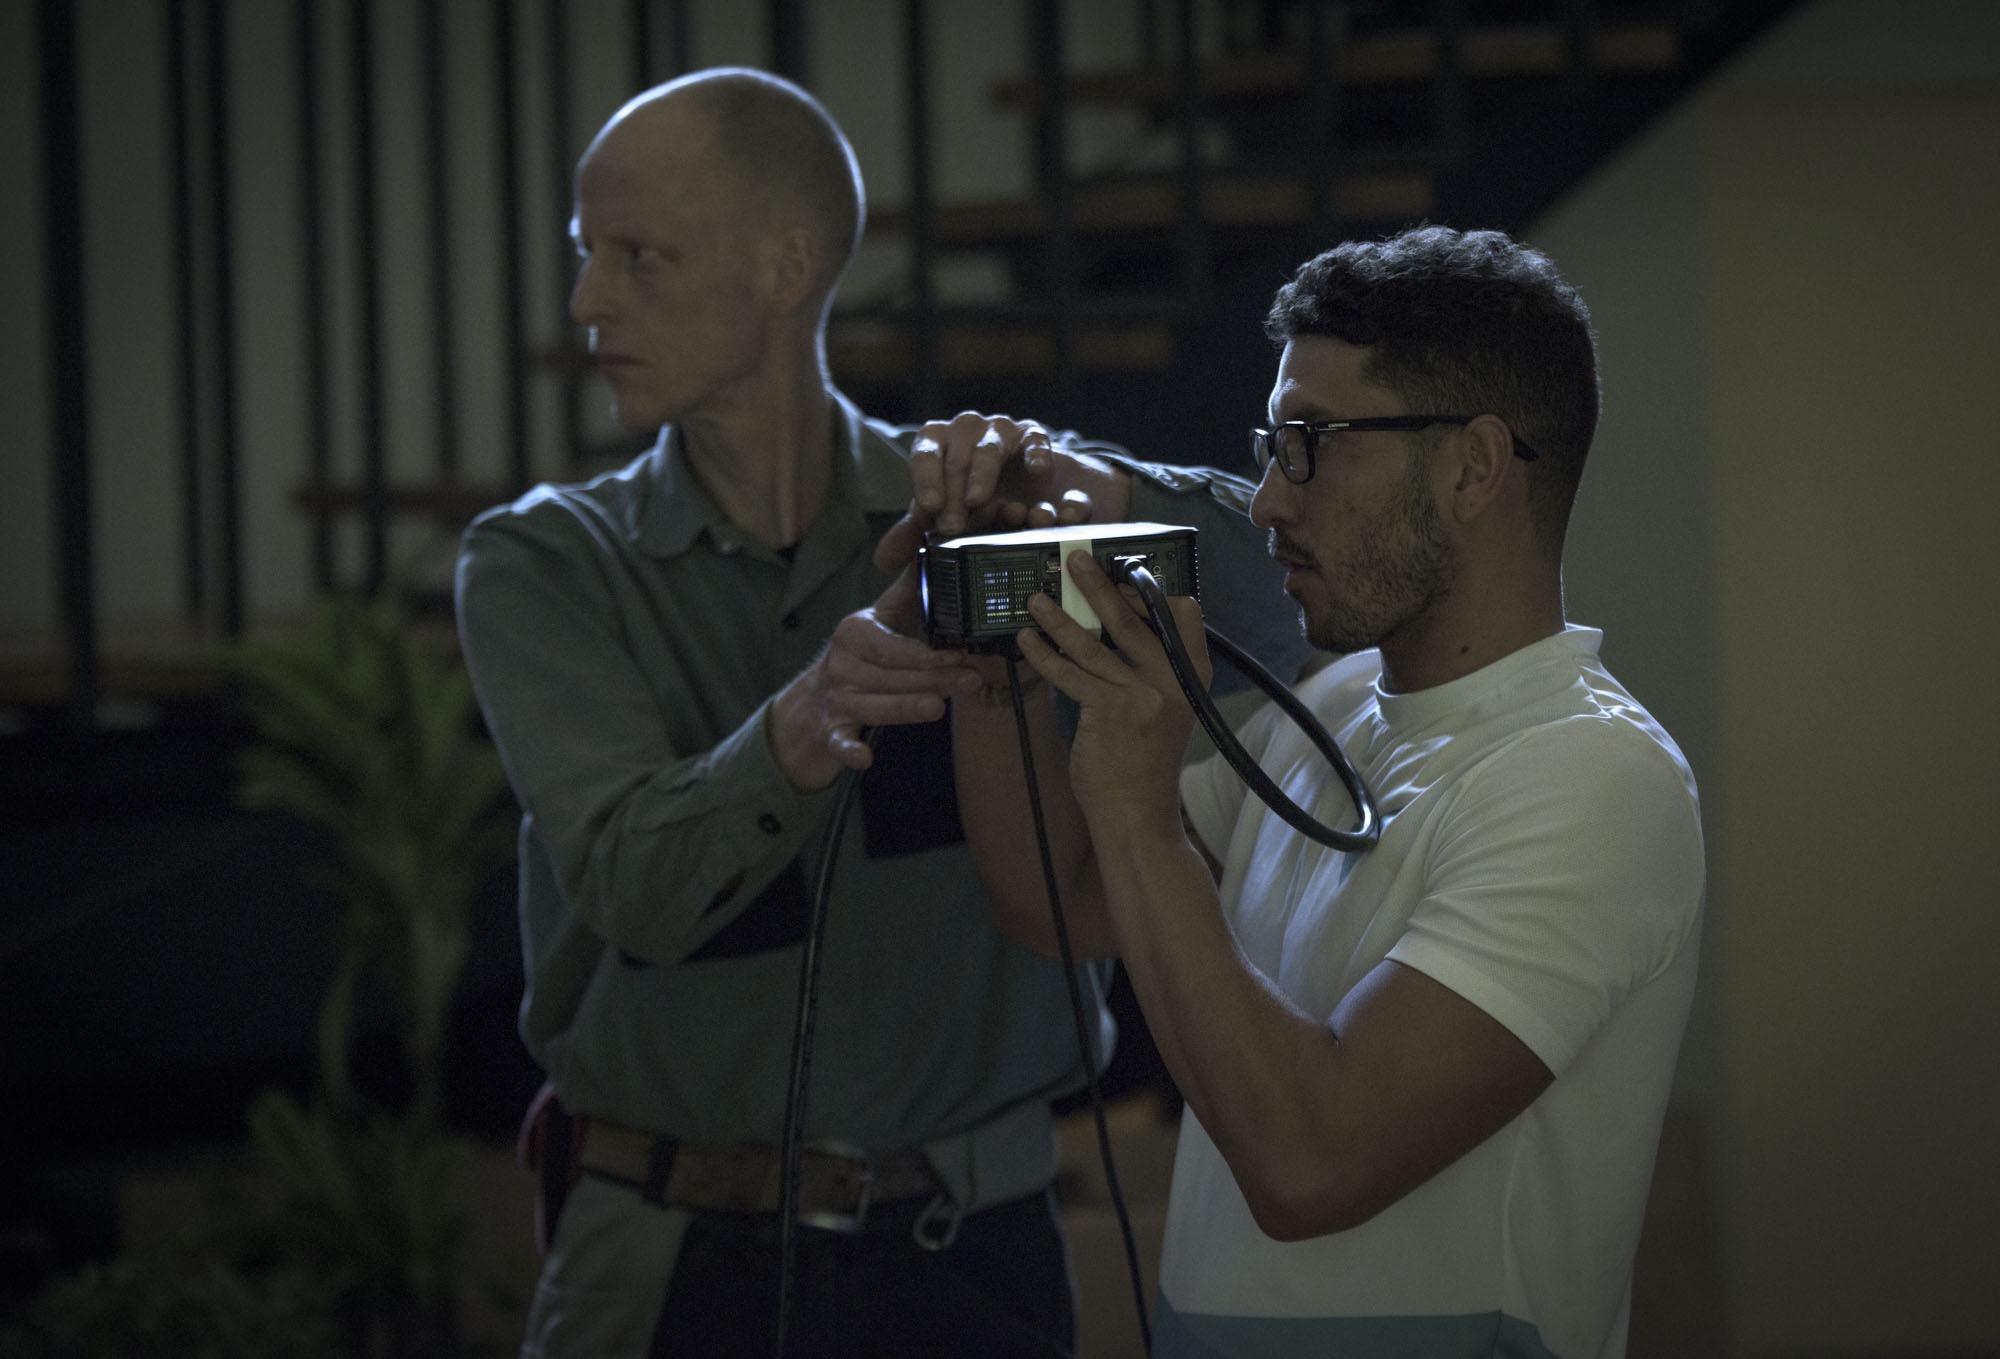 Bruno Serravalle & Iggy 1 ©Frederic Garcia.jpg